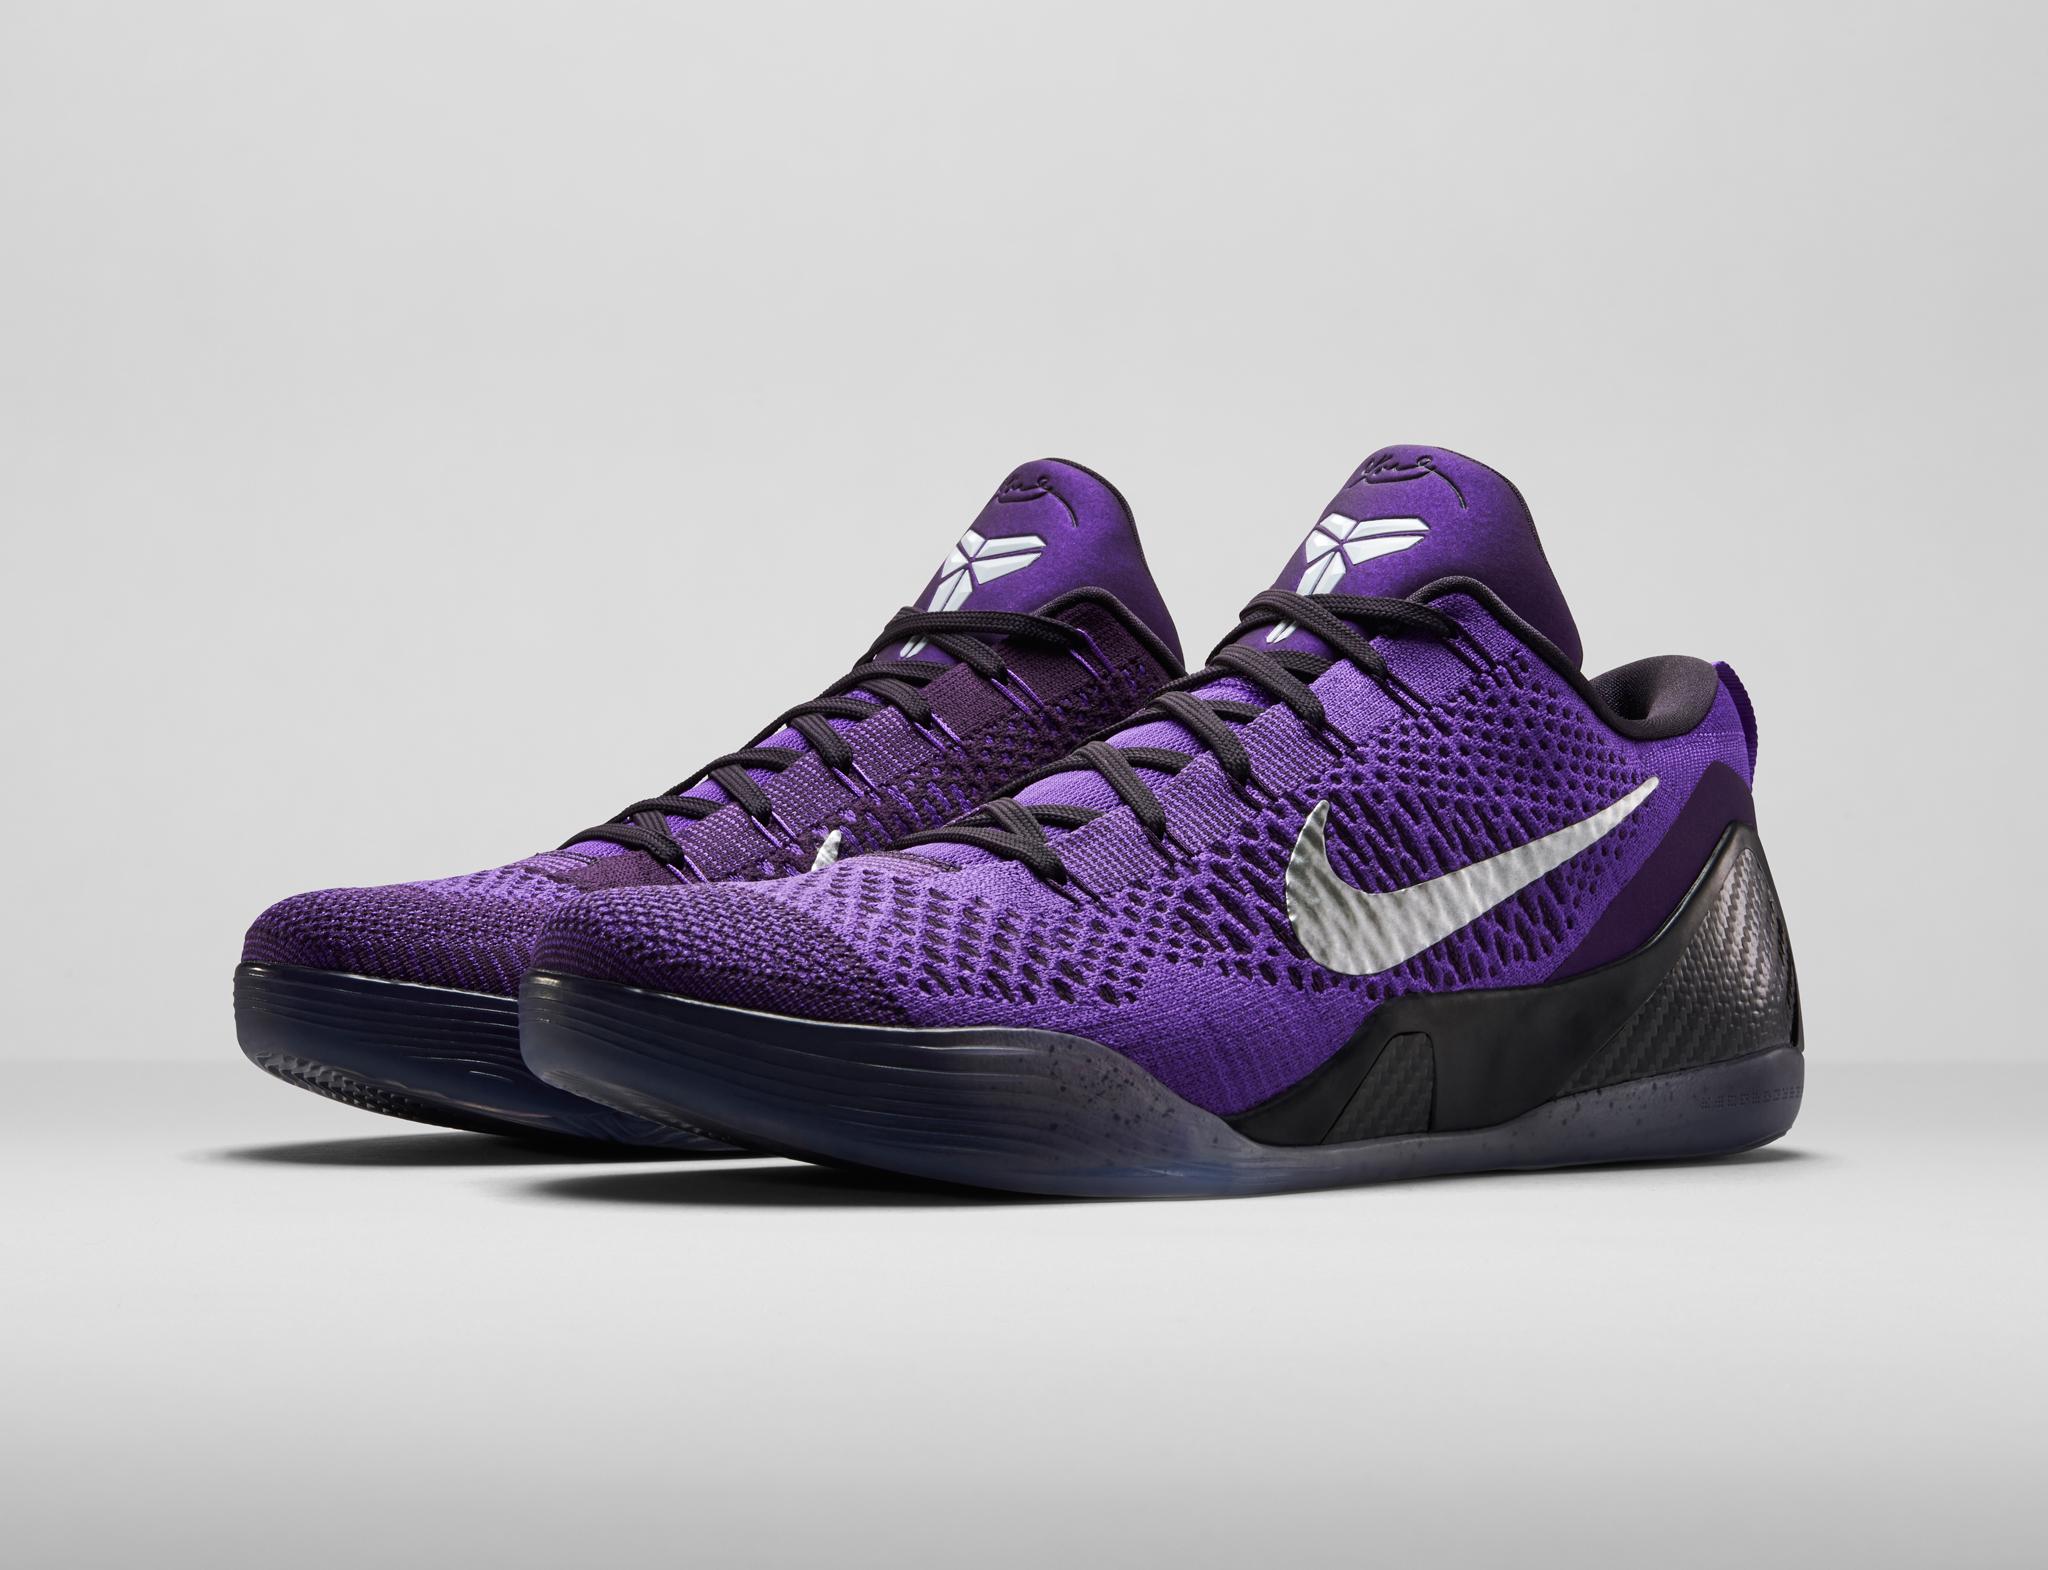 Nike Kobe 9 Elite Low Hyper Grape 1